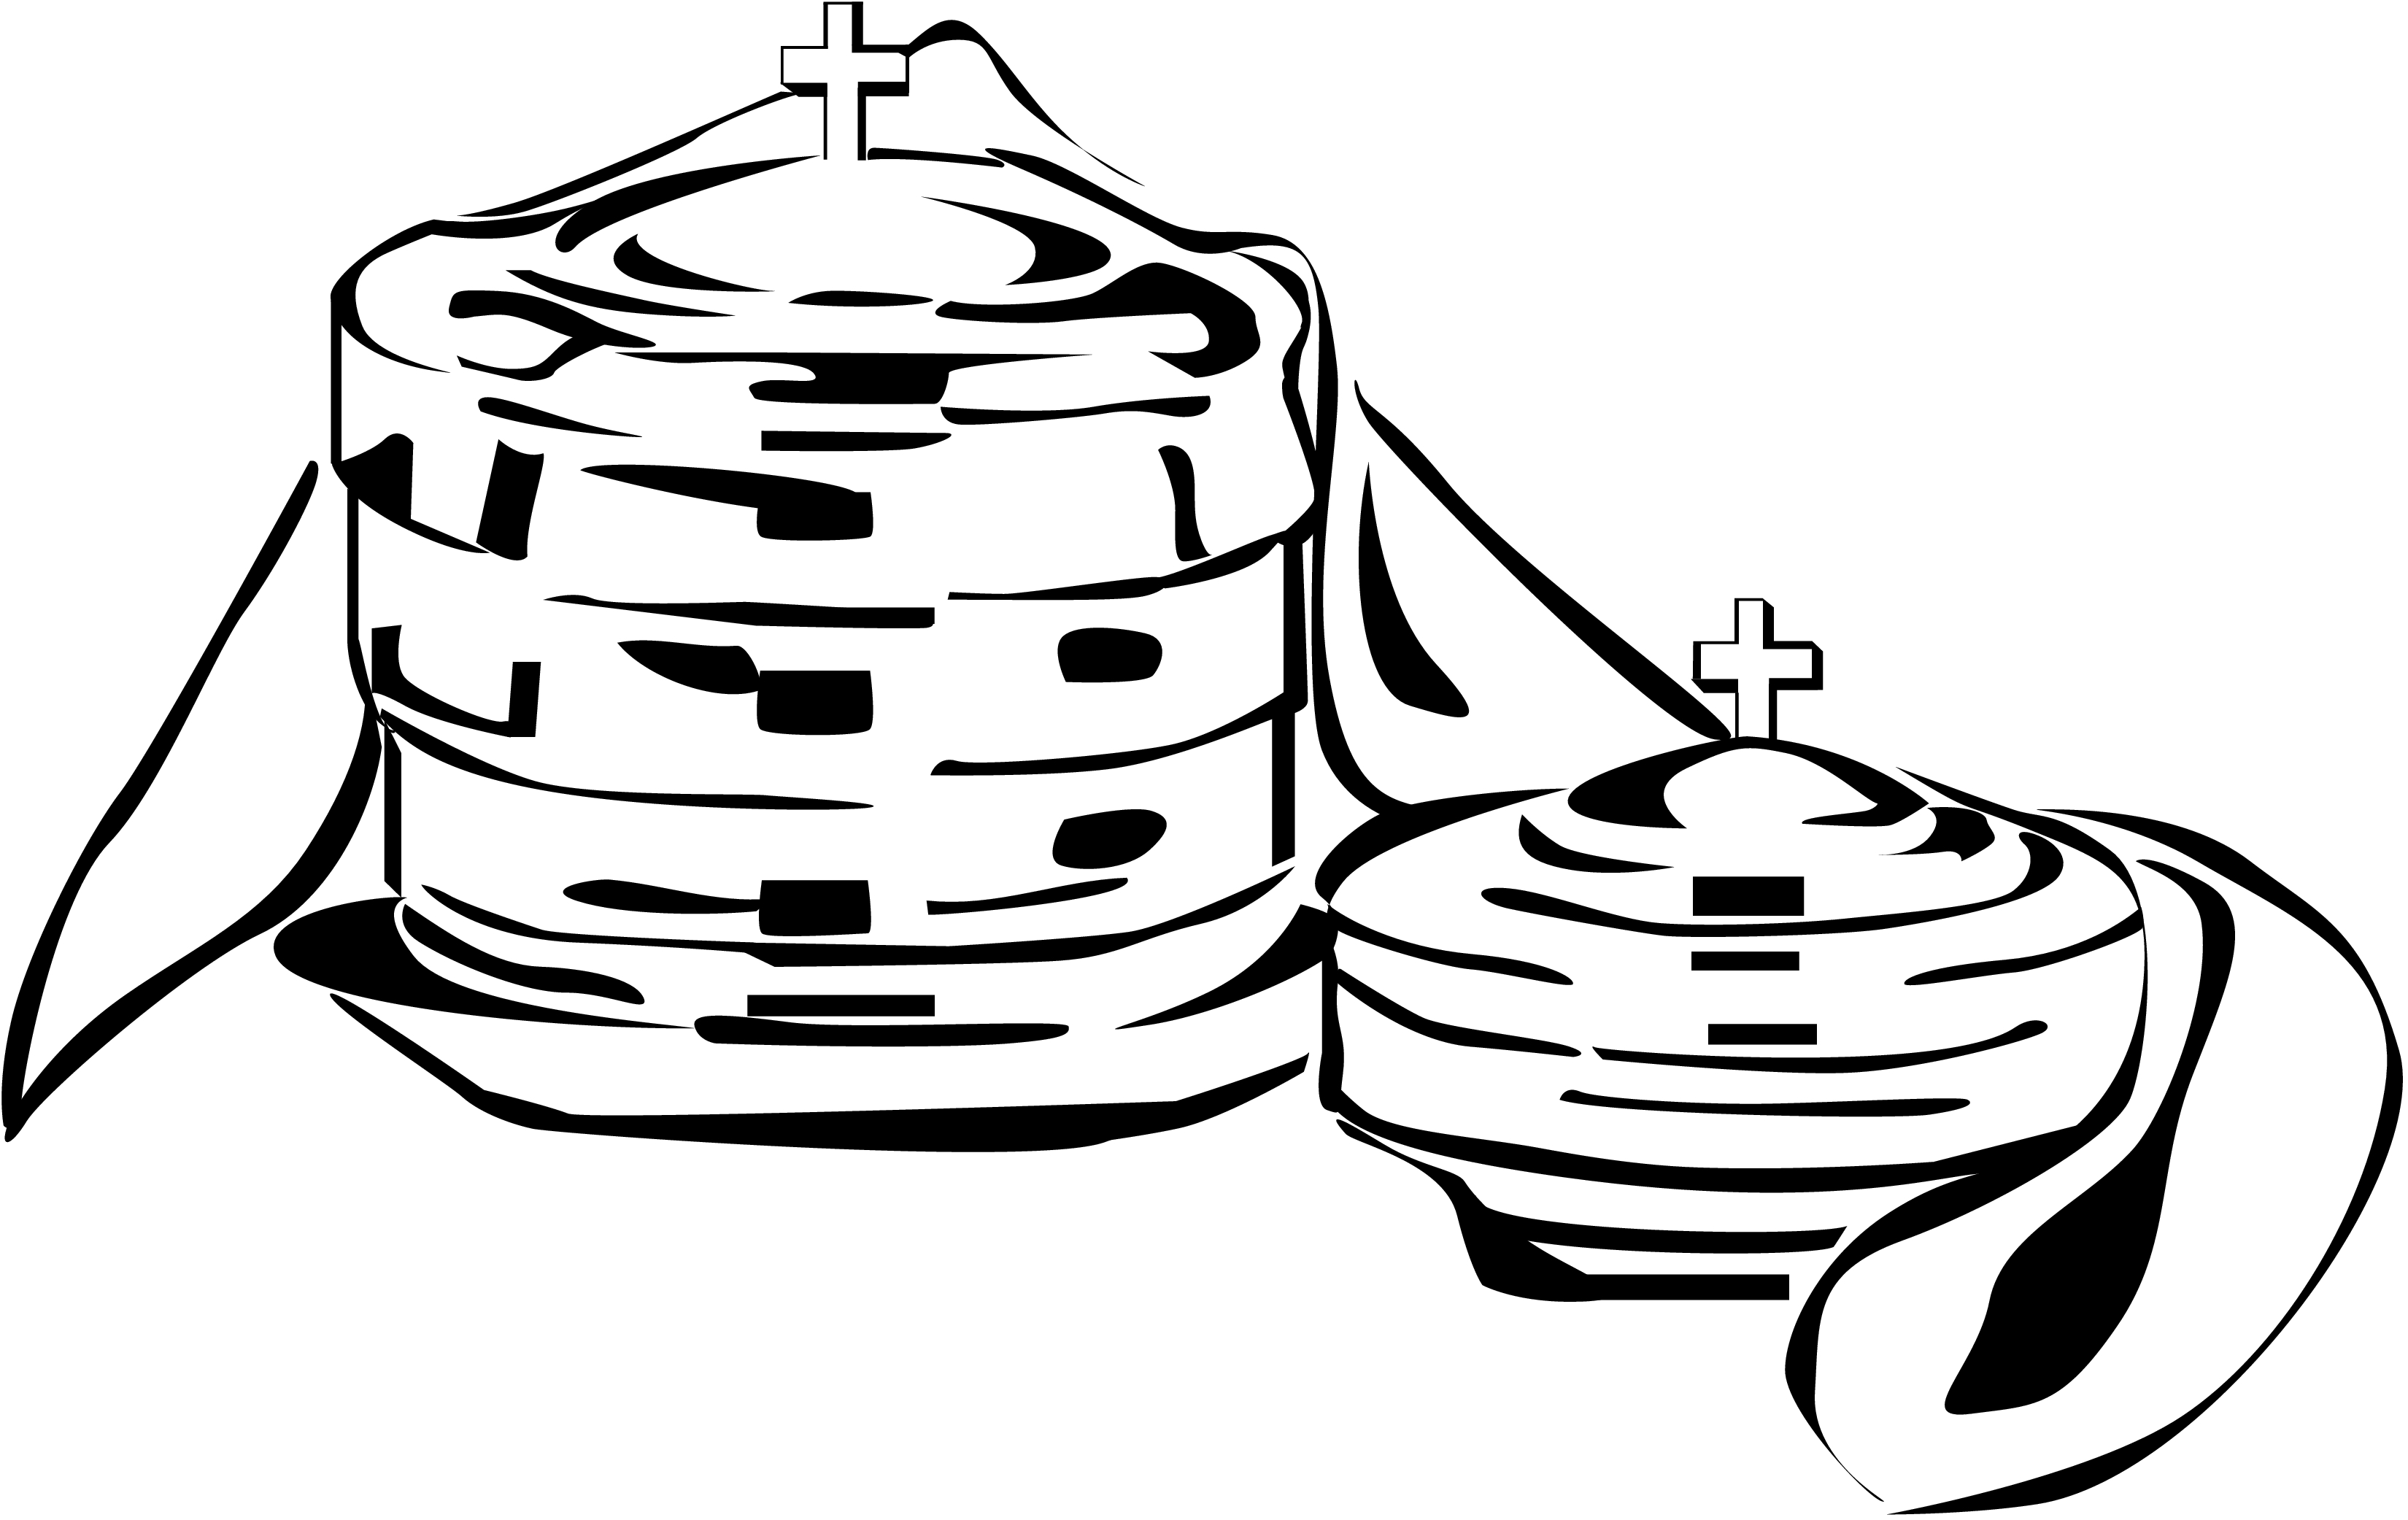 Communion Clip Art Export As Icalendar-Communion Clip Art Export As Icalendar-8